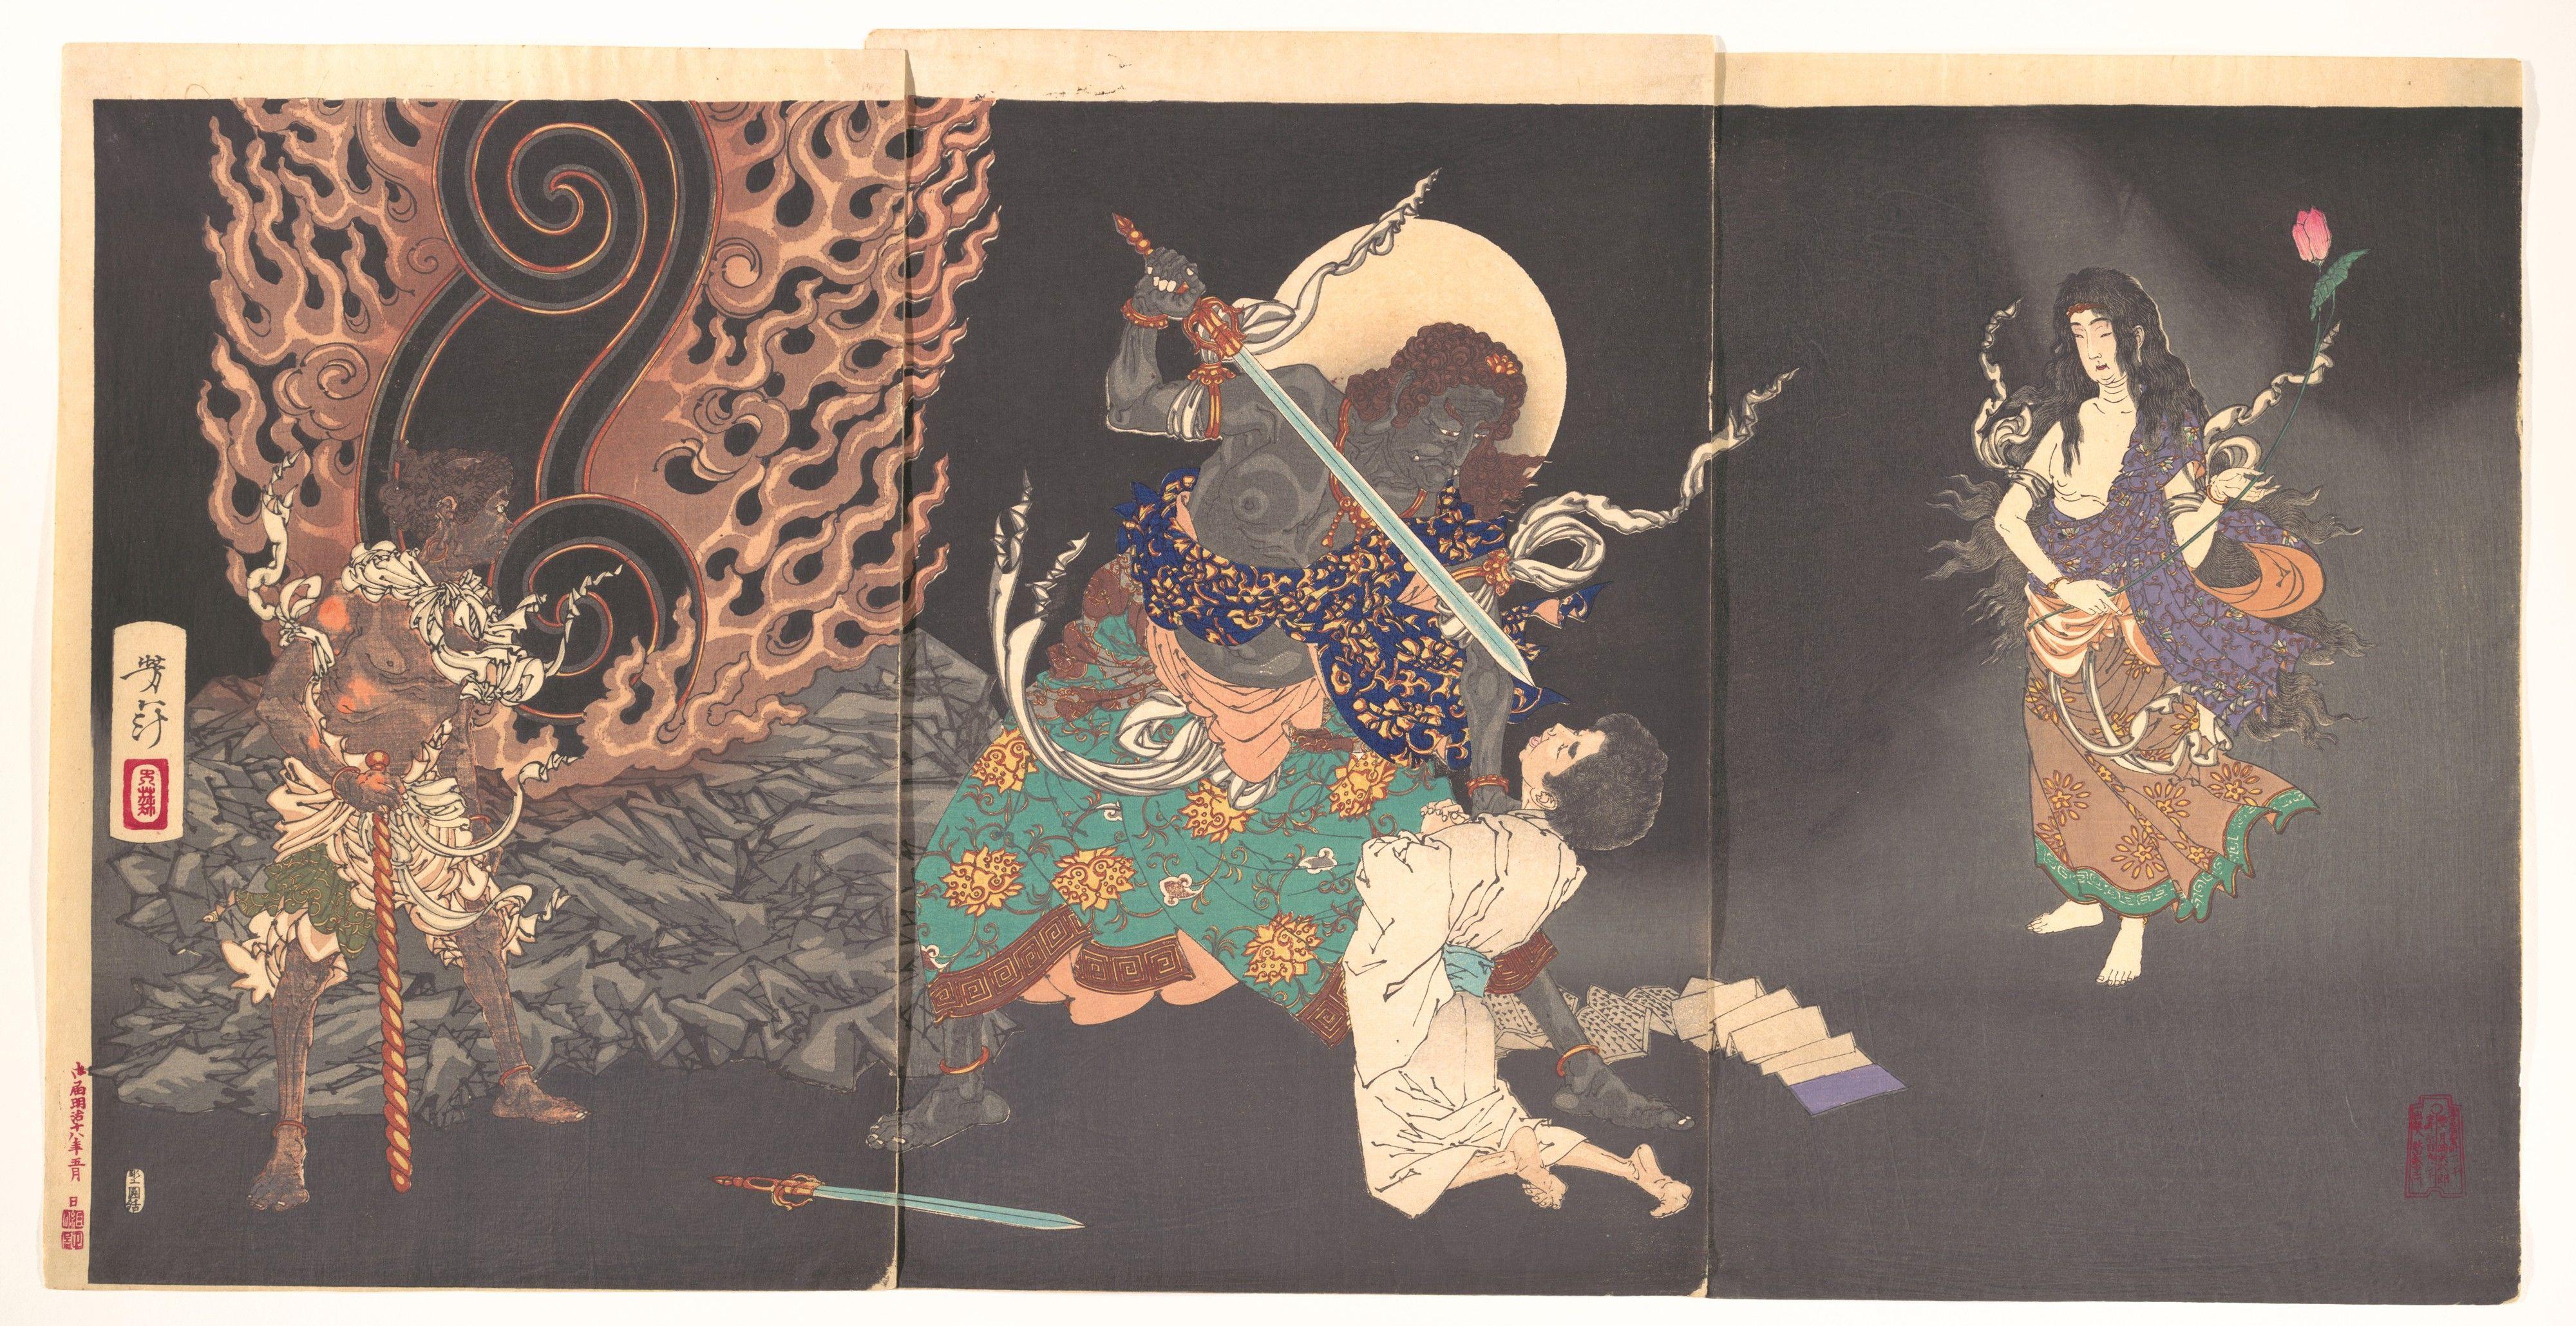 Tsukioka Yoshitoshi | Fudō Myōō Threatening a Novice | Japan | Meiji period (1868–1912) | The Metropolitan Museum of Art